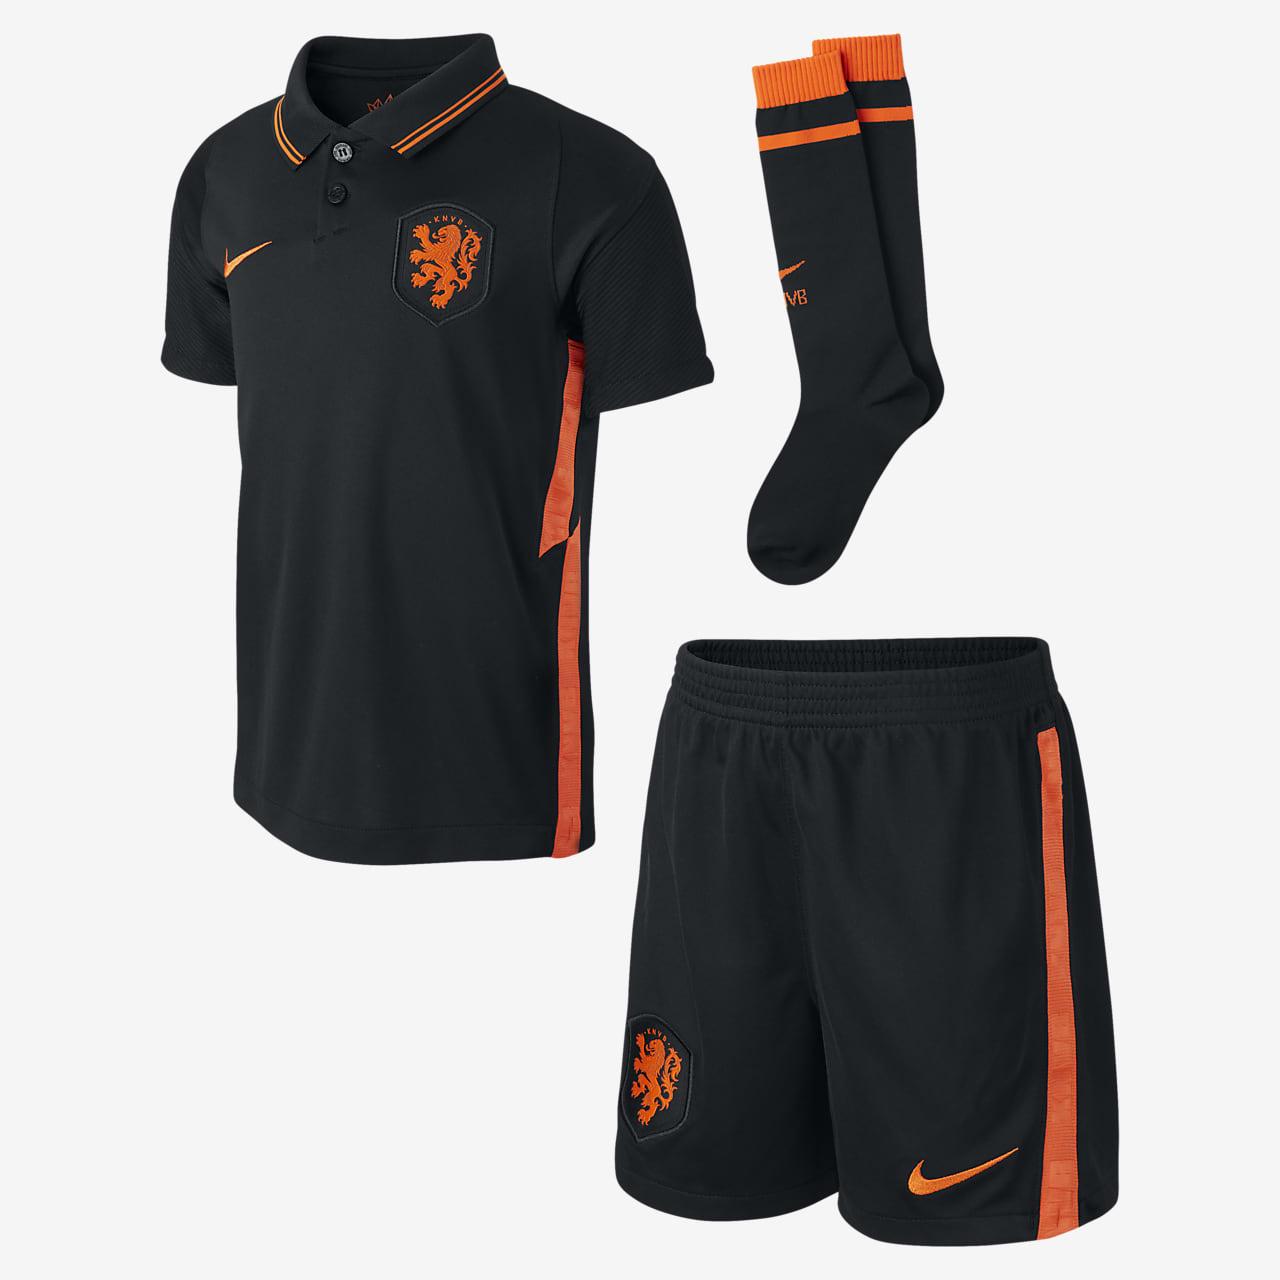 Netherlands 2020 Away Younger Kids' Football Kit